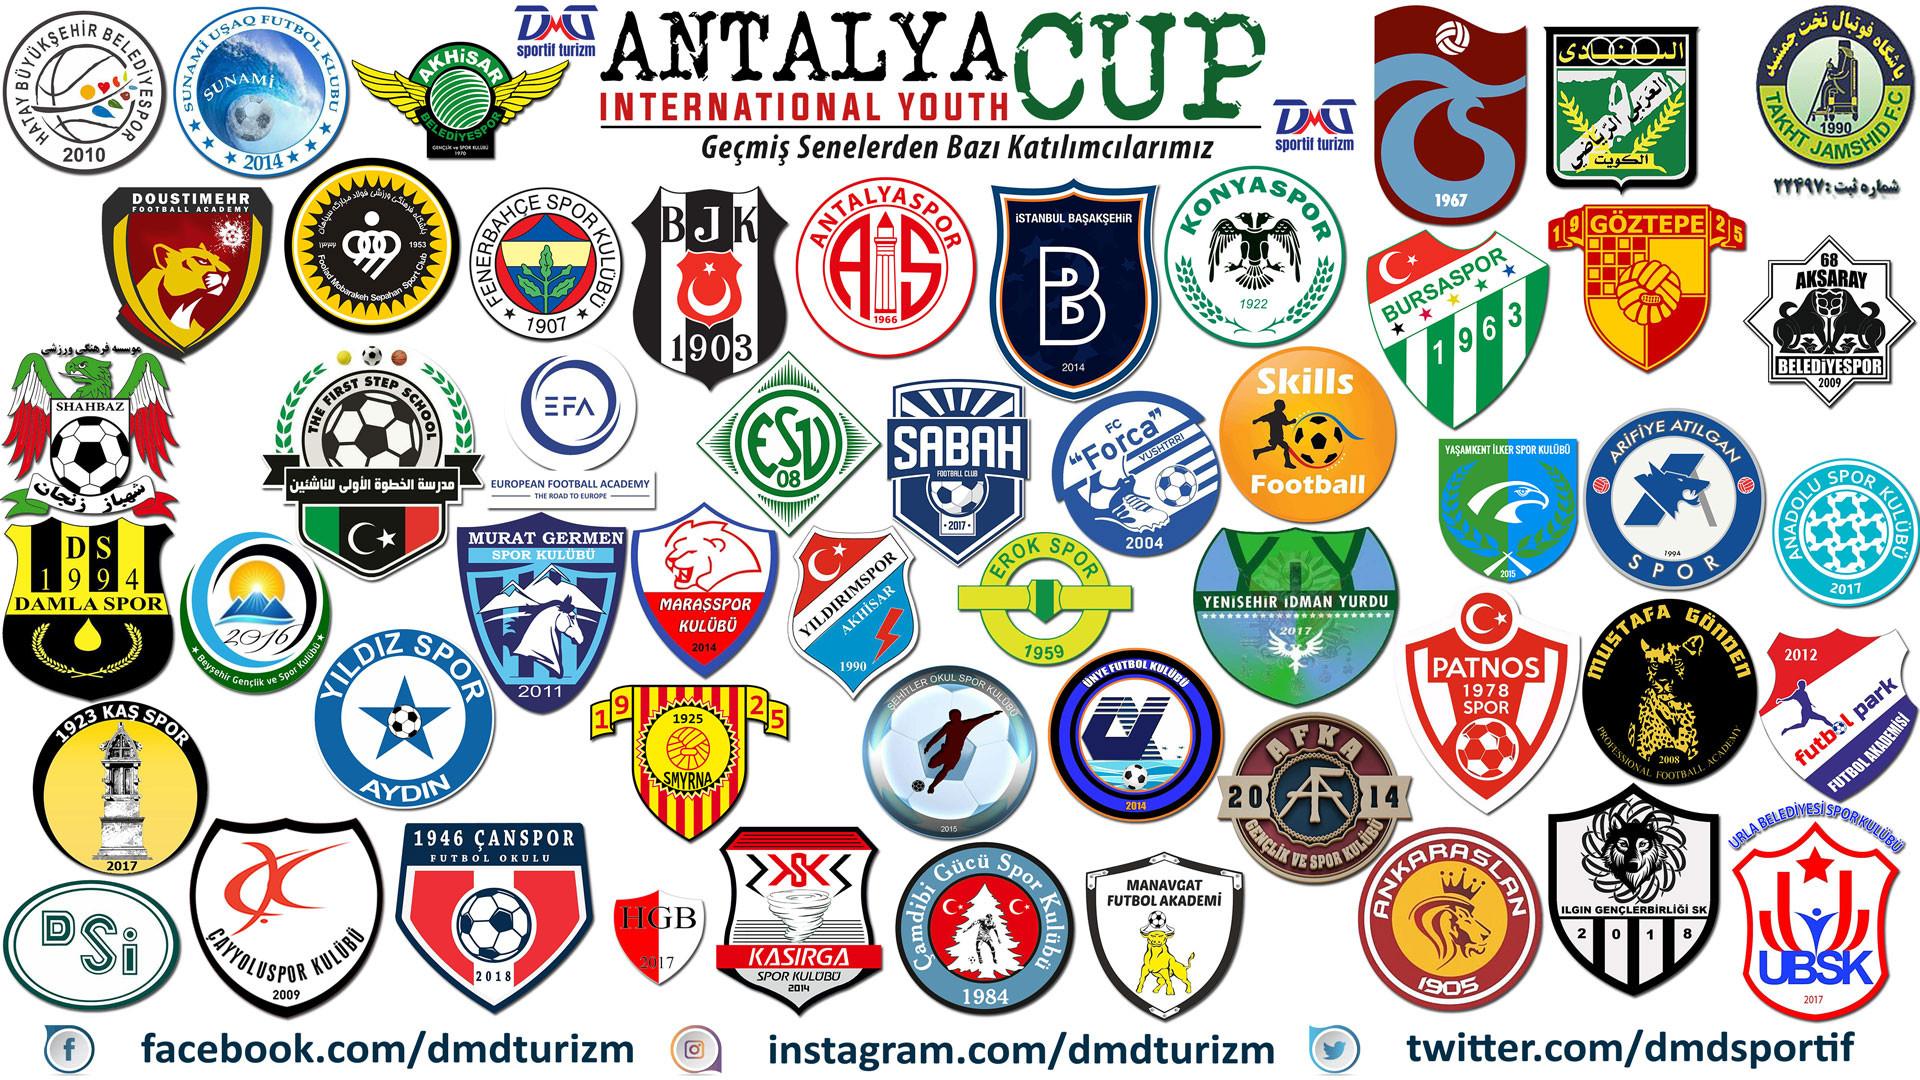 dmd-antalya-cup-mix.jpg